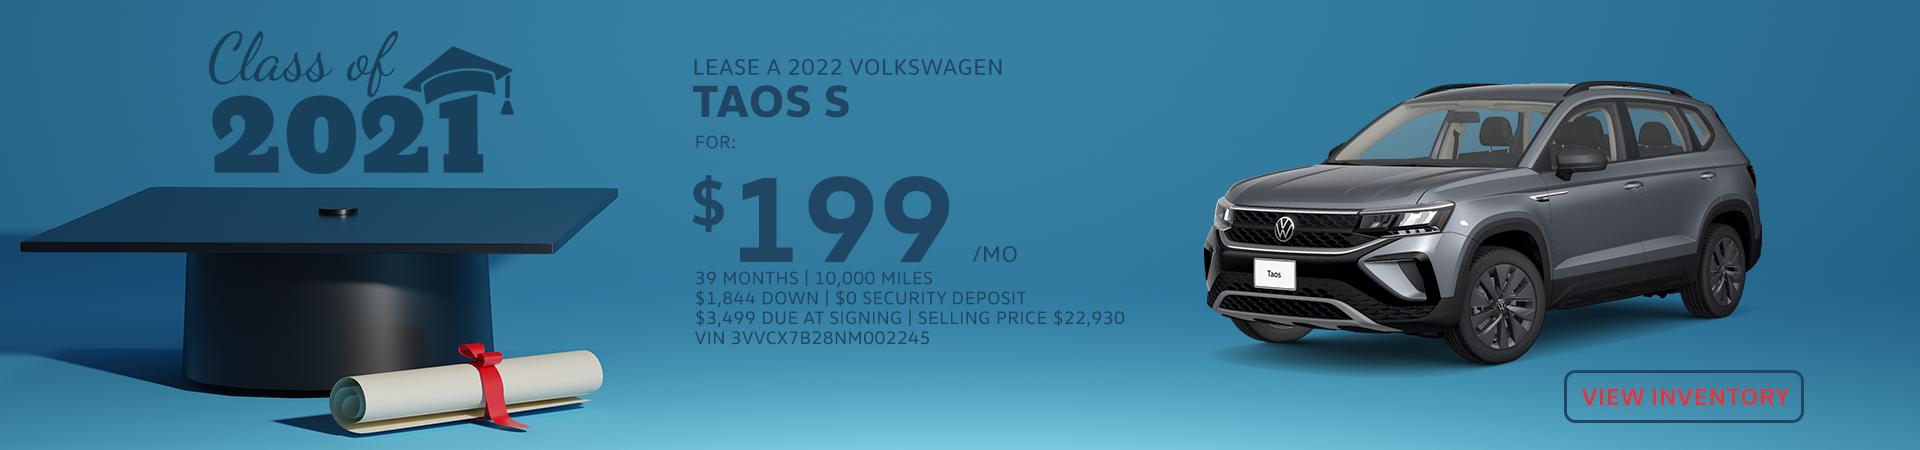 Wynn VW_June Offer_Taos